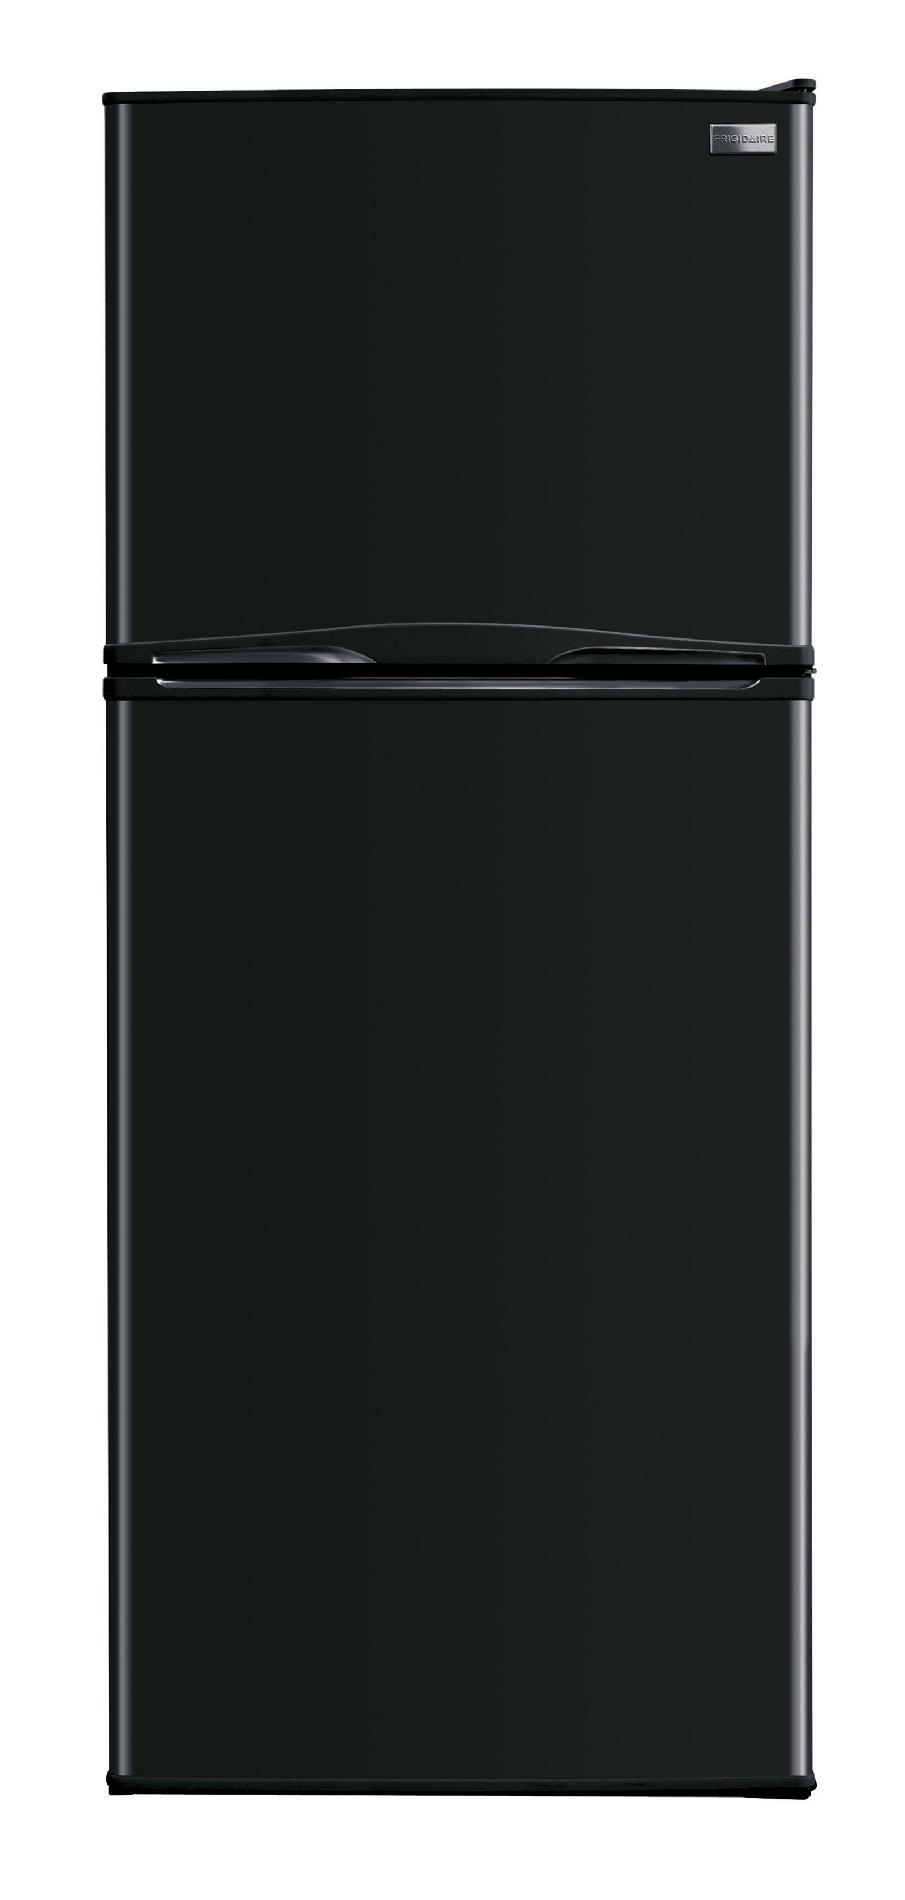 Frigidaire Ffpt10f3nb 10.0 Cu. Ft. Top-freezer Refrigerator - Black